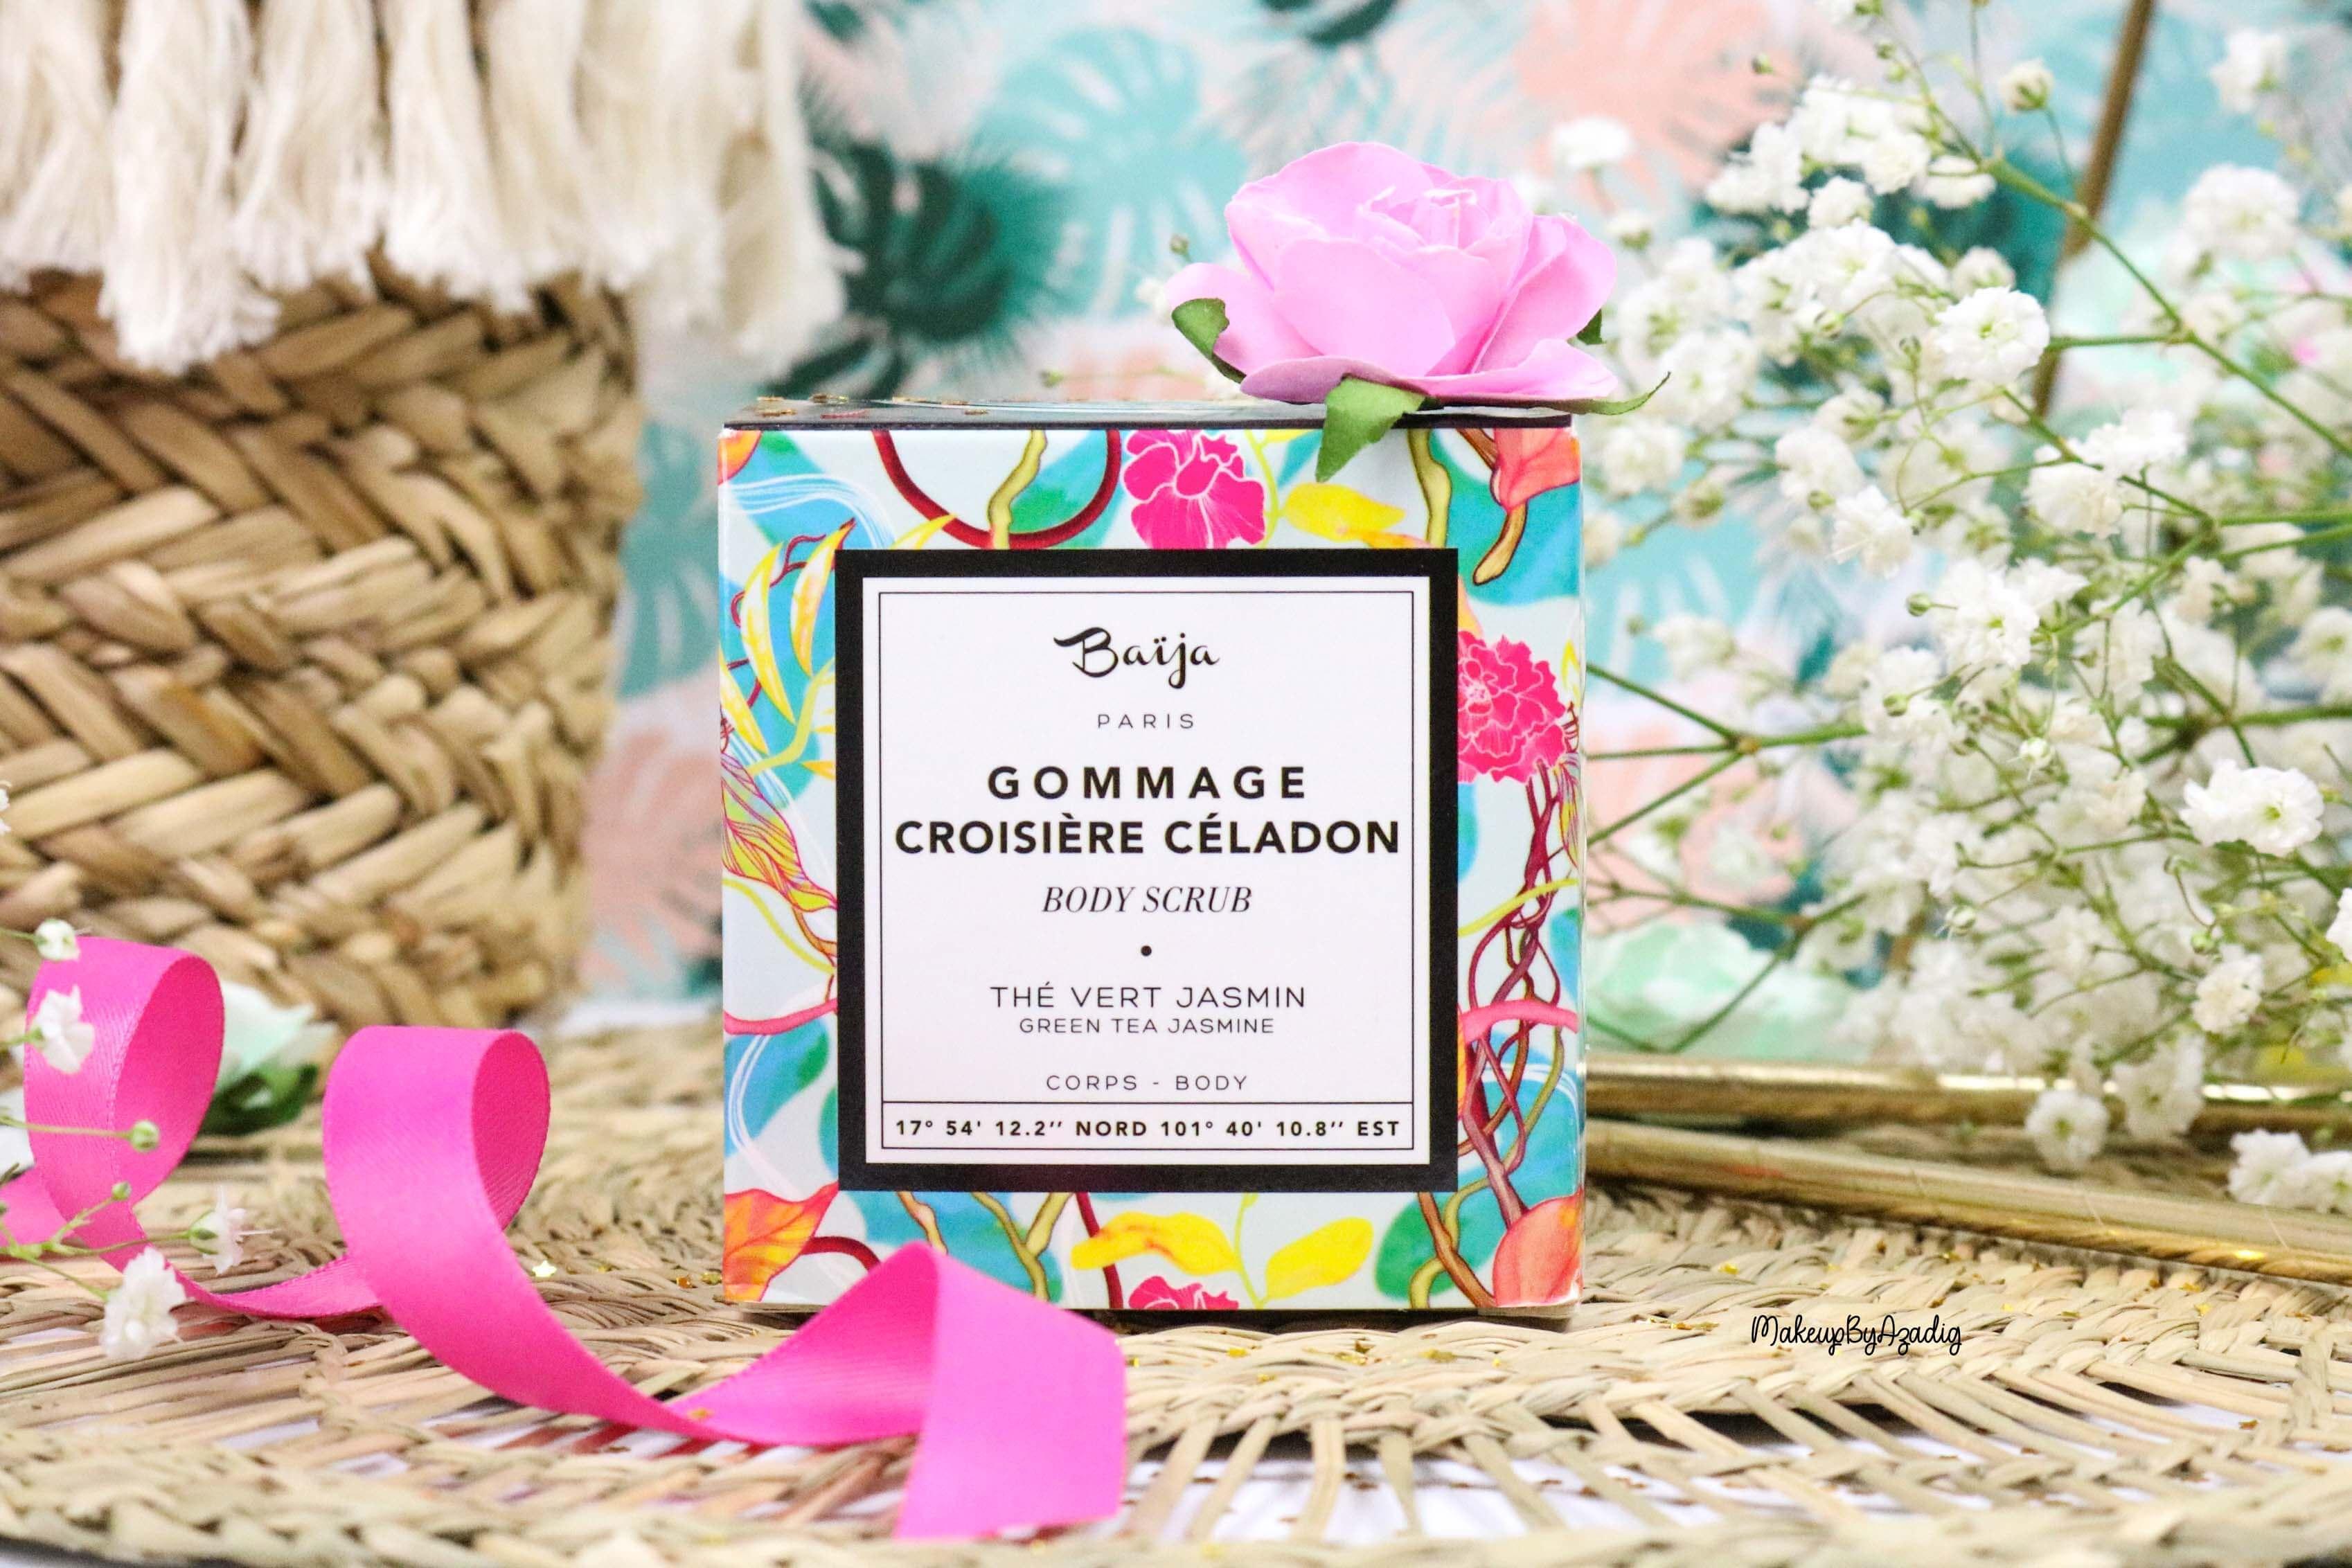 revue-gommage-corps-doux-croisiere-celadon-baija-thevert-jasmin-sephora-avis-prix-madeinfrance-makeupbyazadig-packaging